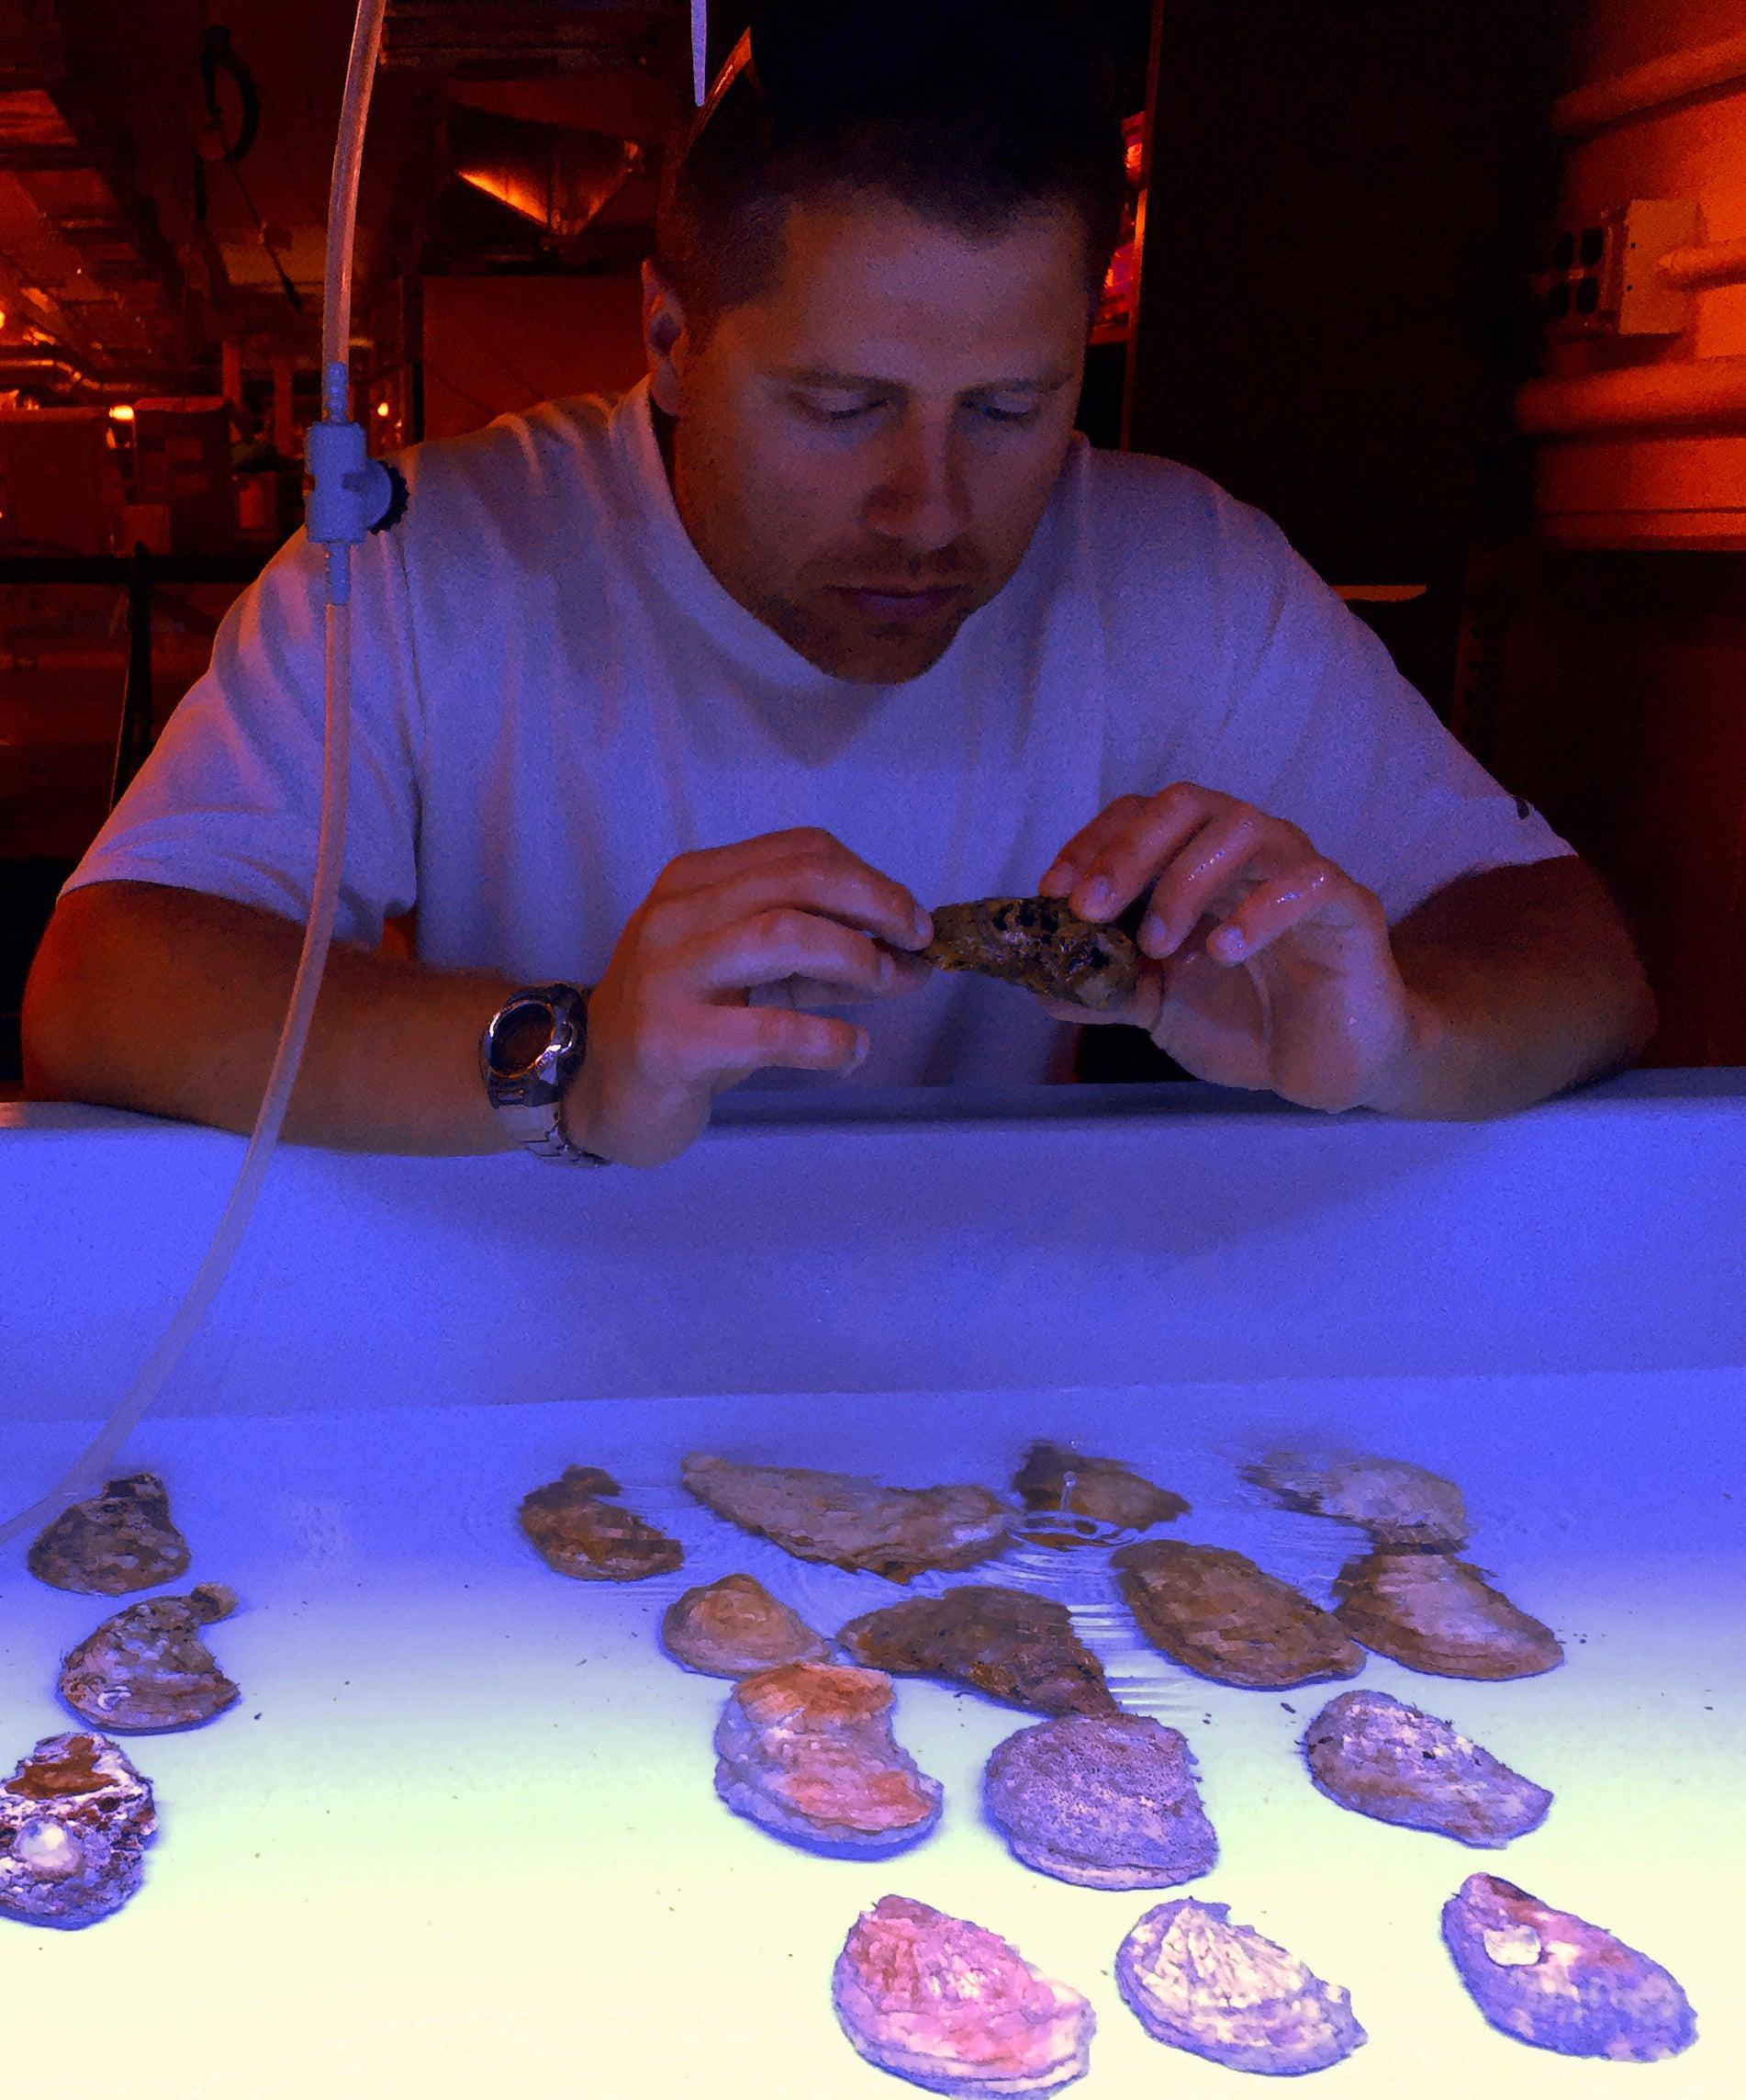 Jonathan Puritz examines oysters